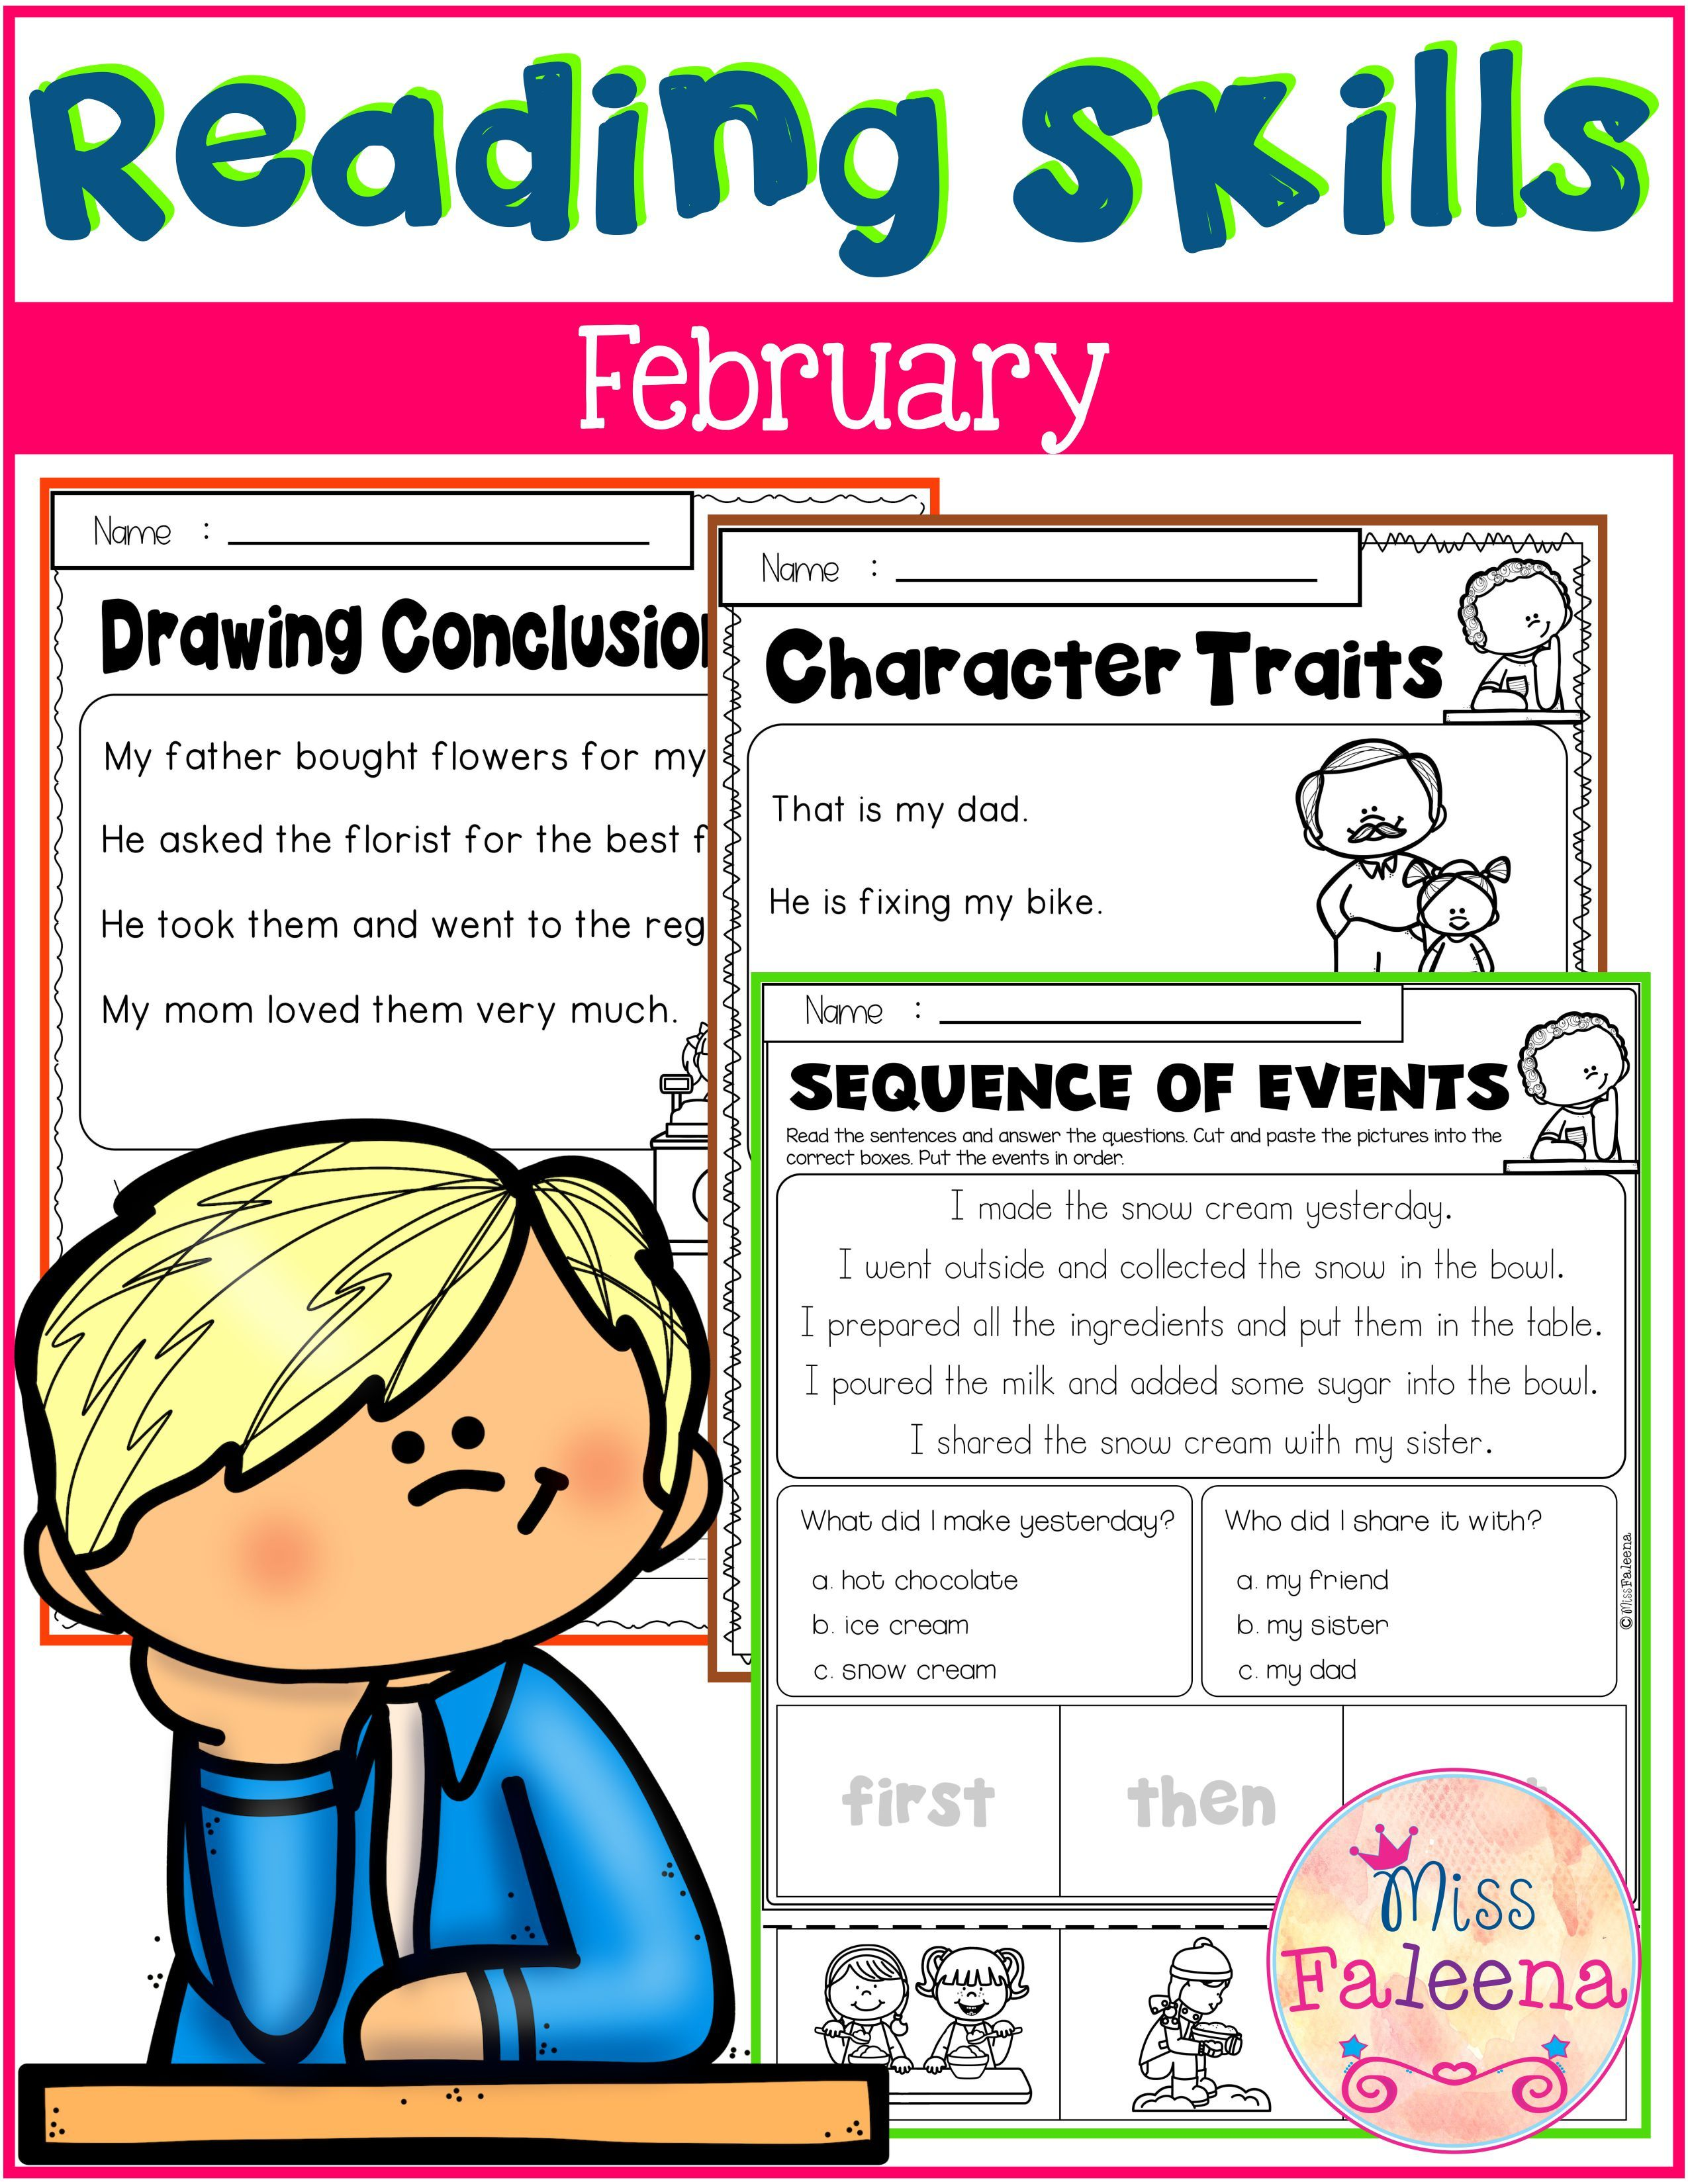 February Reading Skills Di